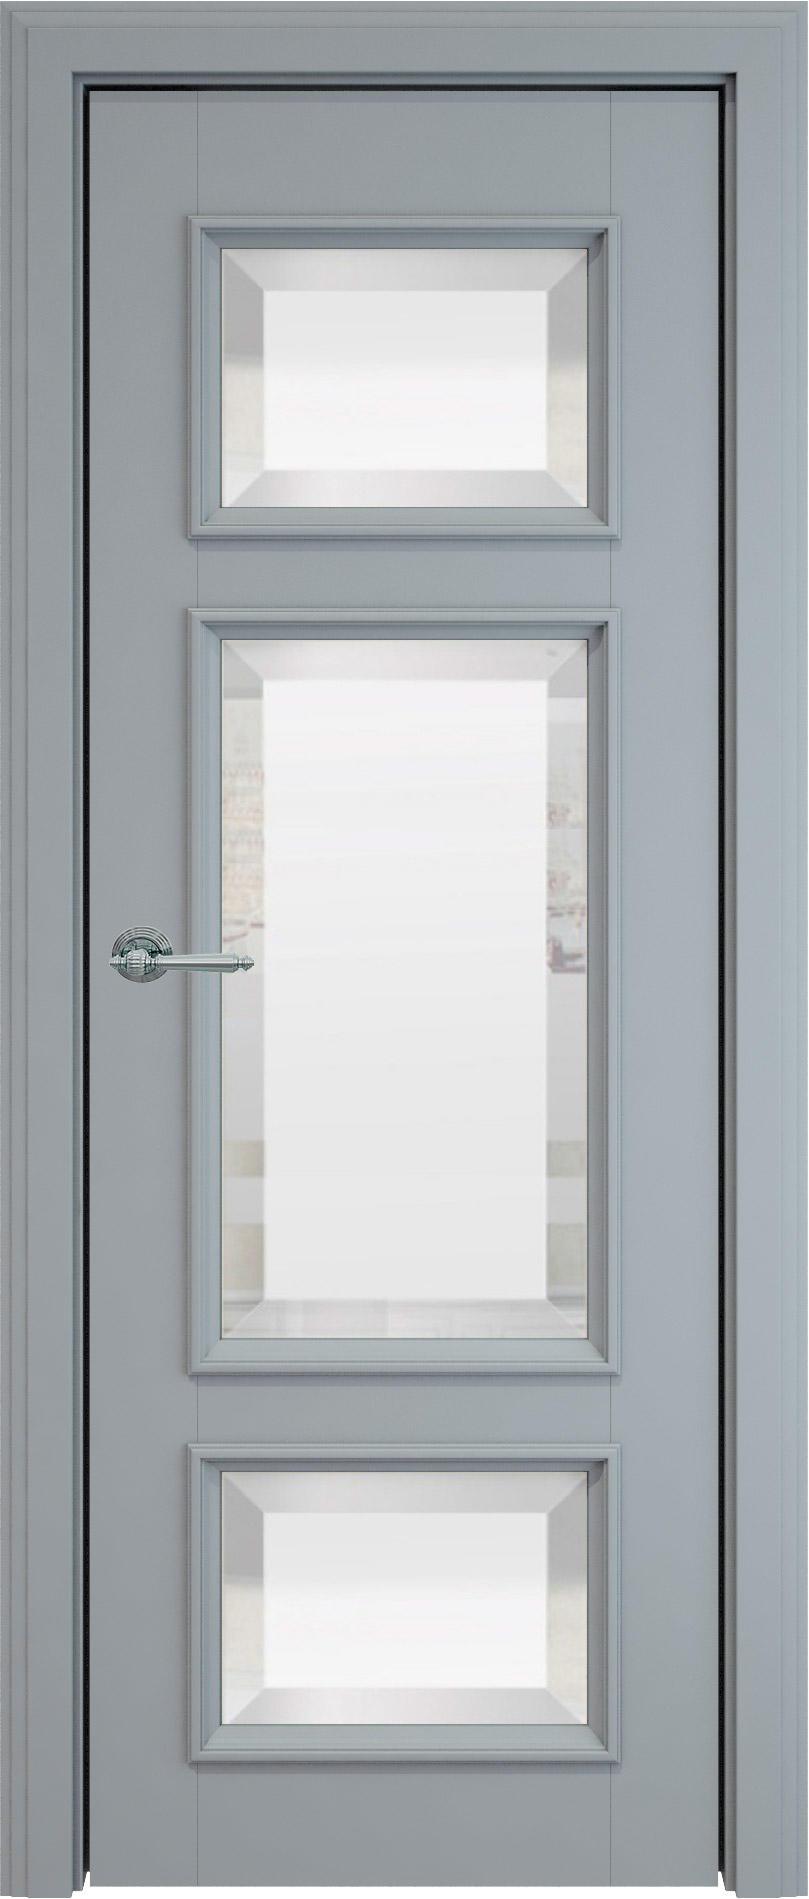 Siena LUX цвет - Серебристо-серая эмаль (RAL 7045) Со стеклом (ДО)